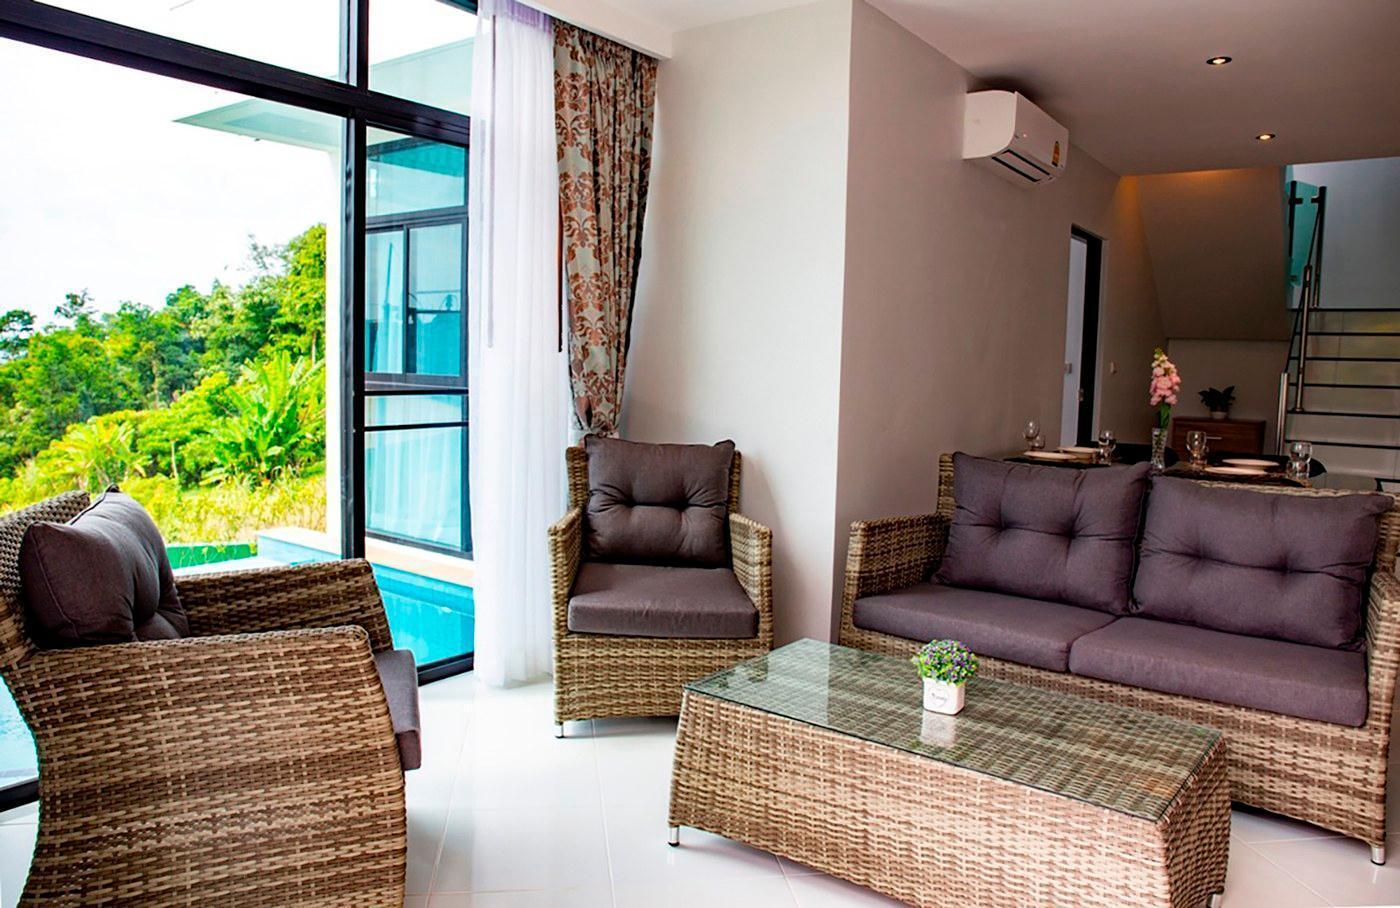 Private 360 Degree Sea View Luxury Villa วิลลา 2 ห้องนอน 2 ห้องน้ำส่วนตัว ขนาด 162 ตร.ม. – กมลา